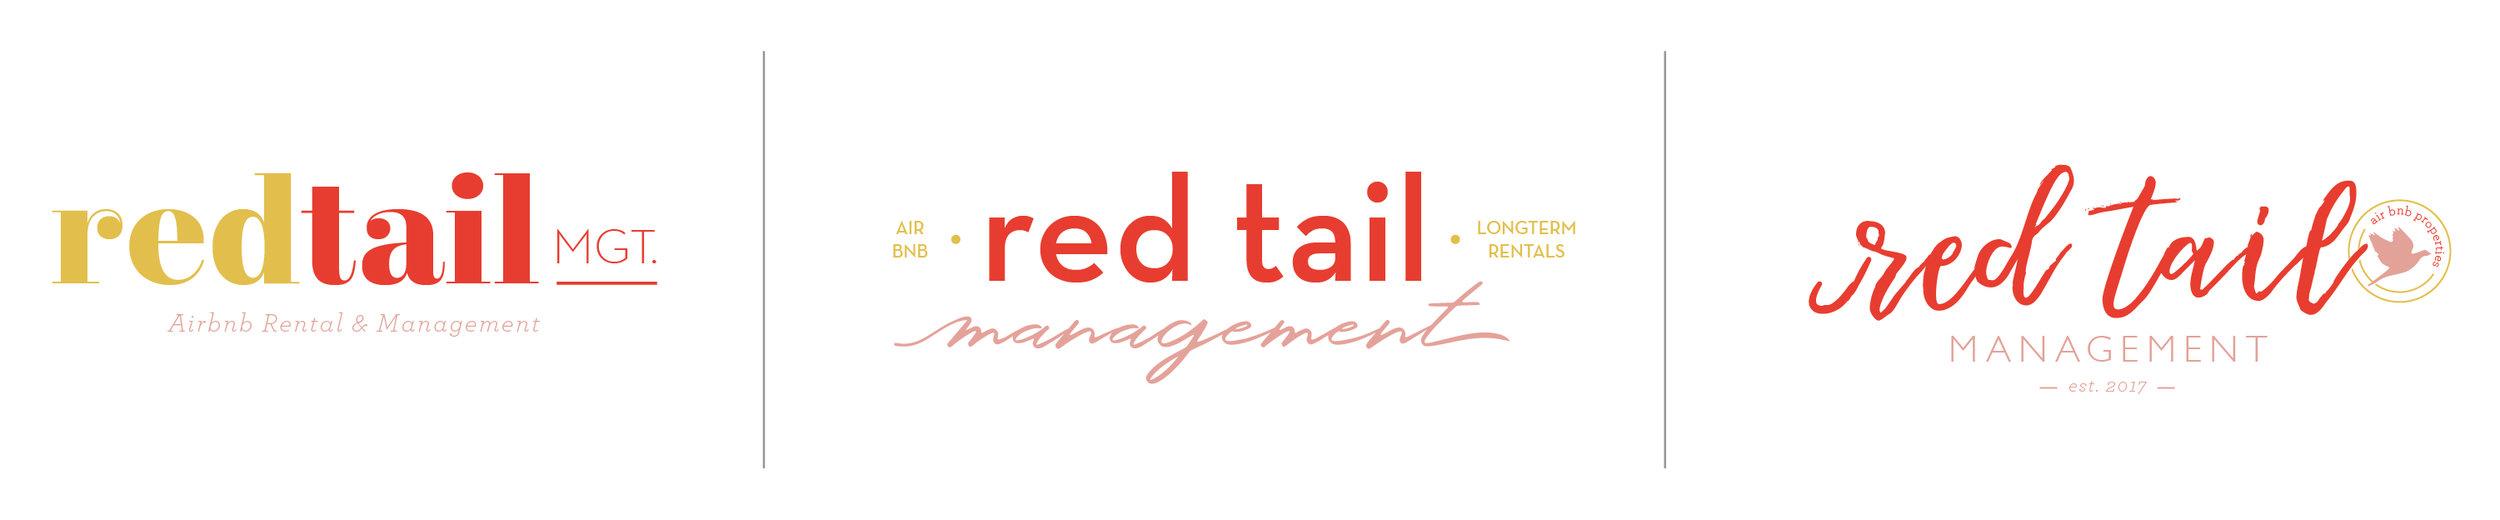 RedTail_LogoConcepts-04.jpg